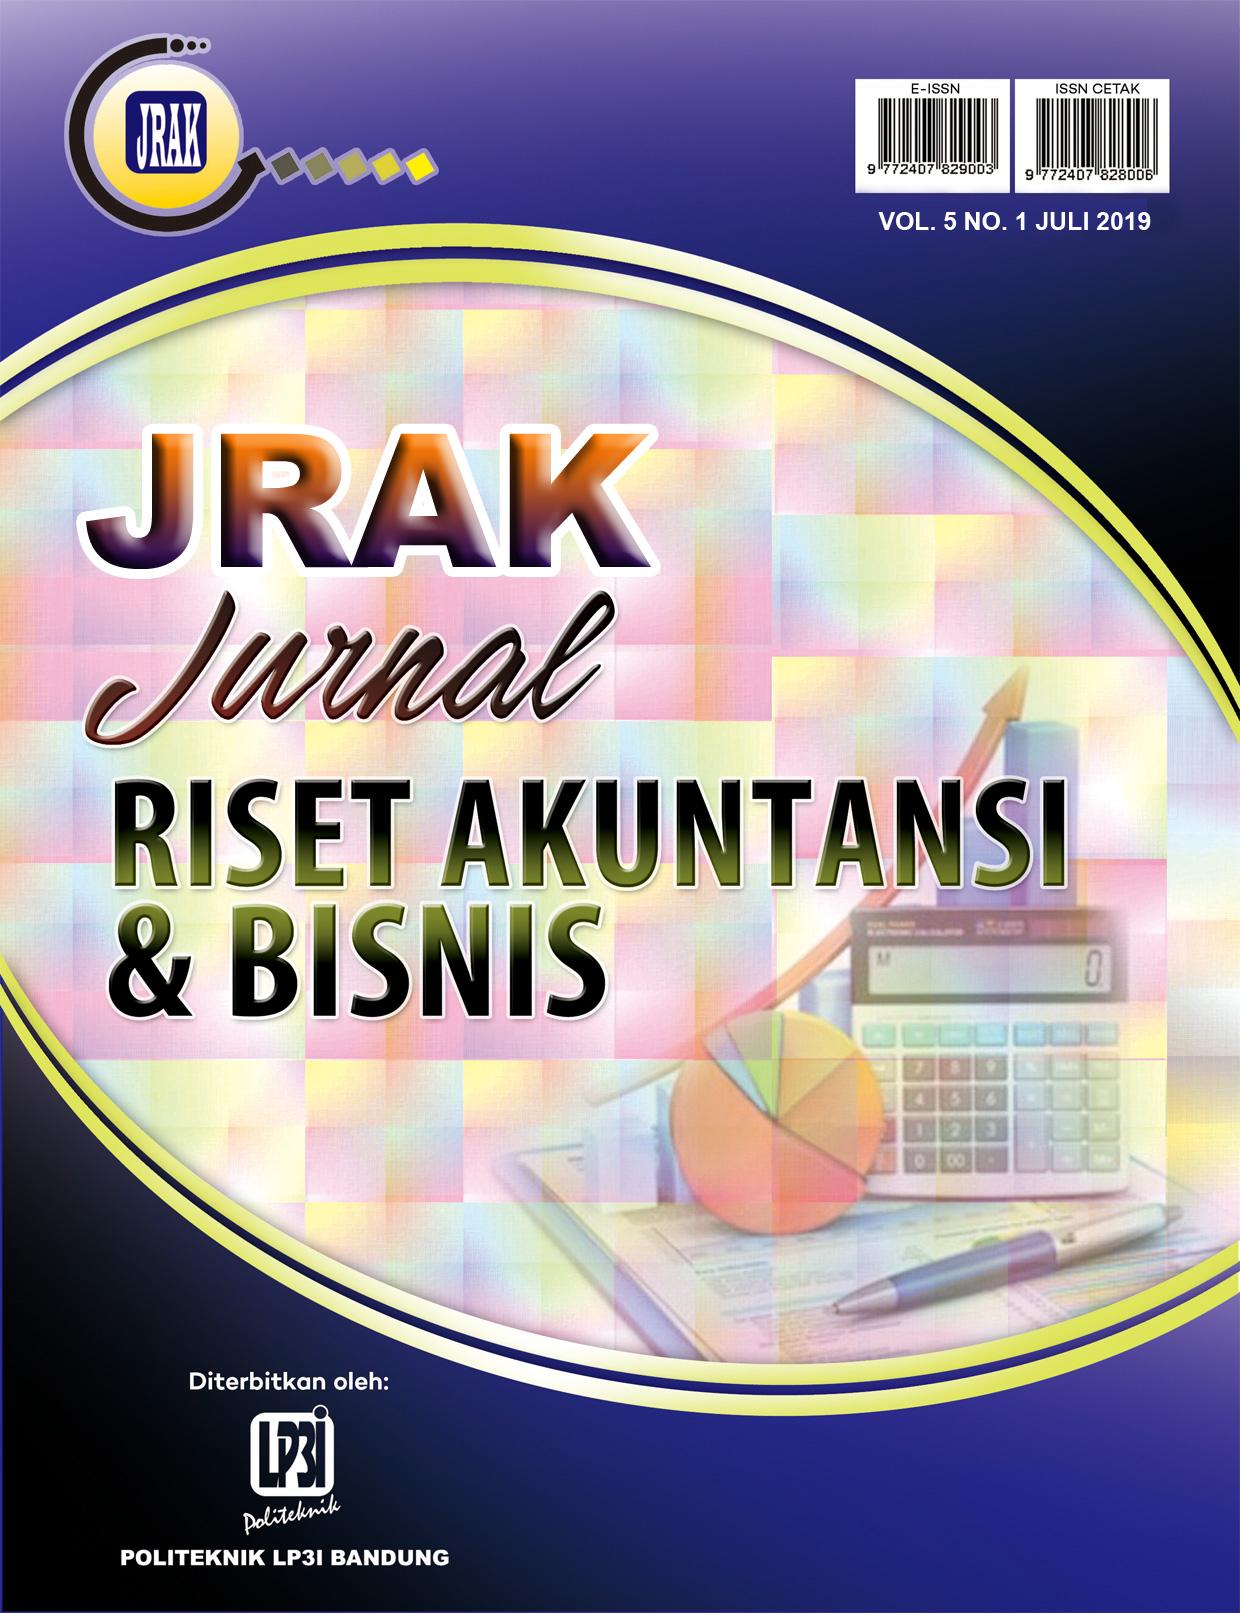 JURNAL JRAK